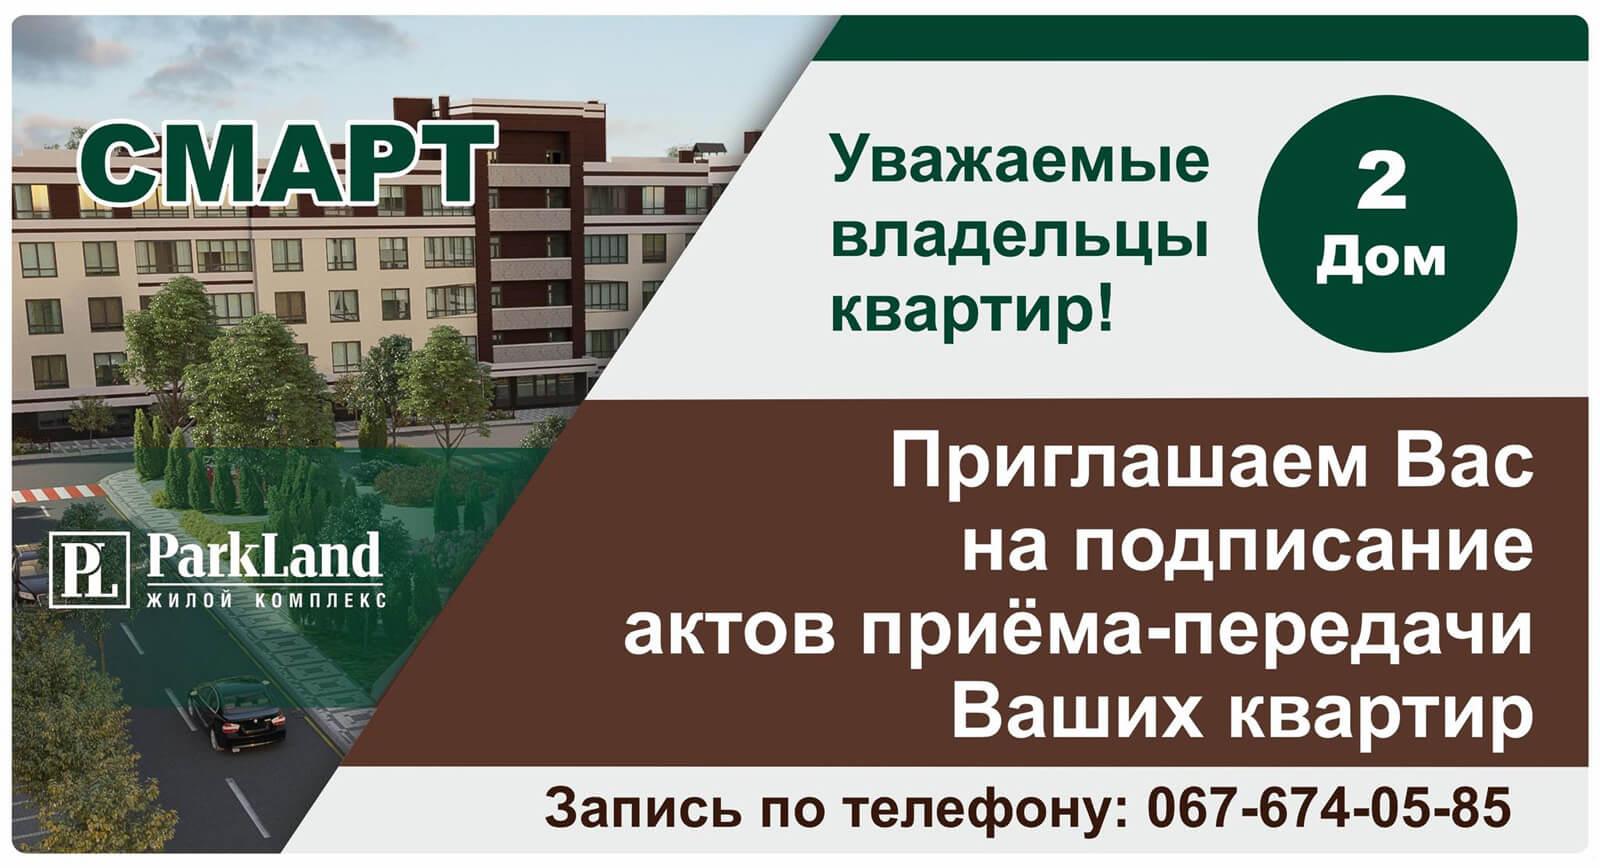 news-210618-ru-2